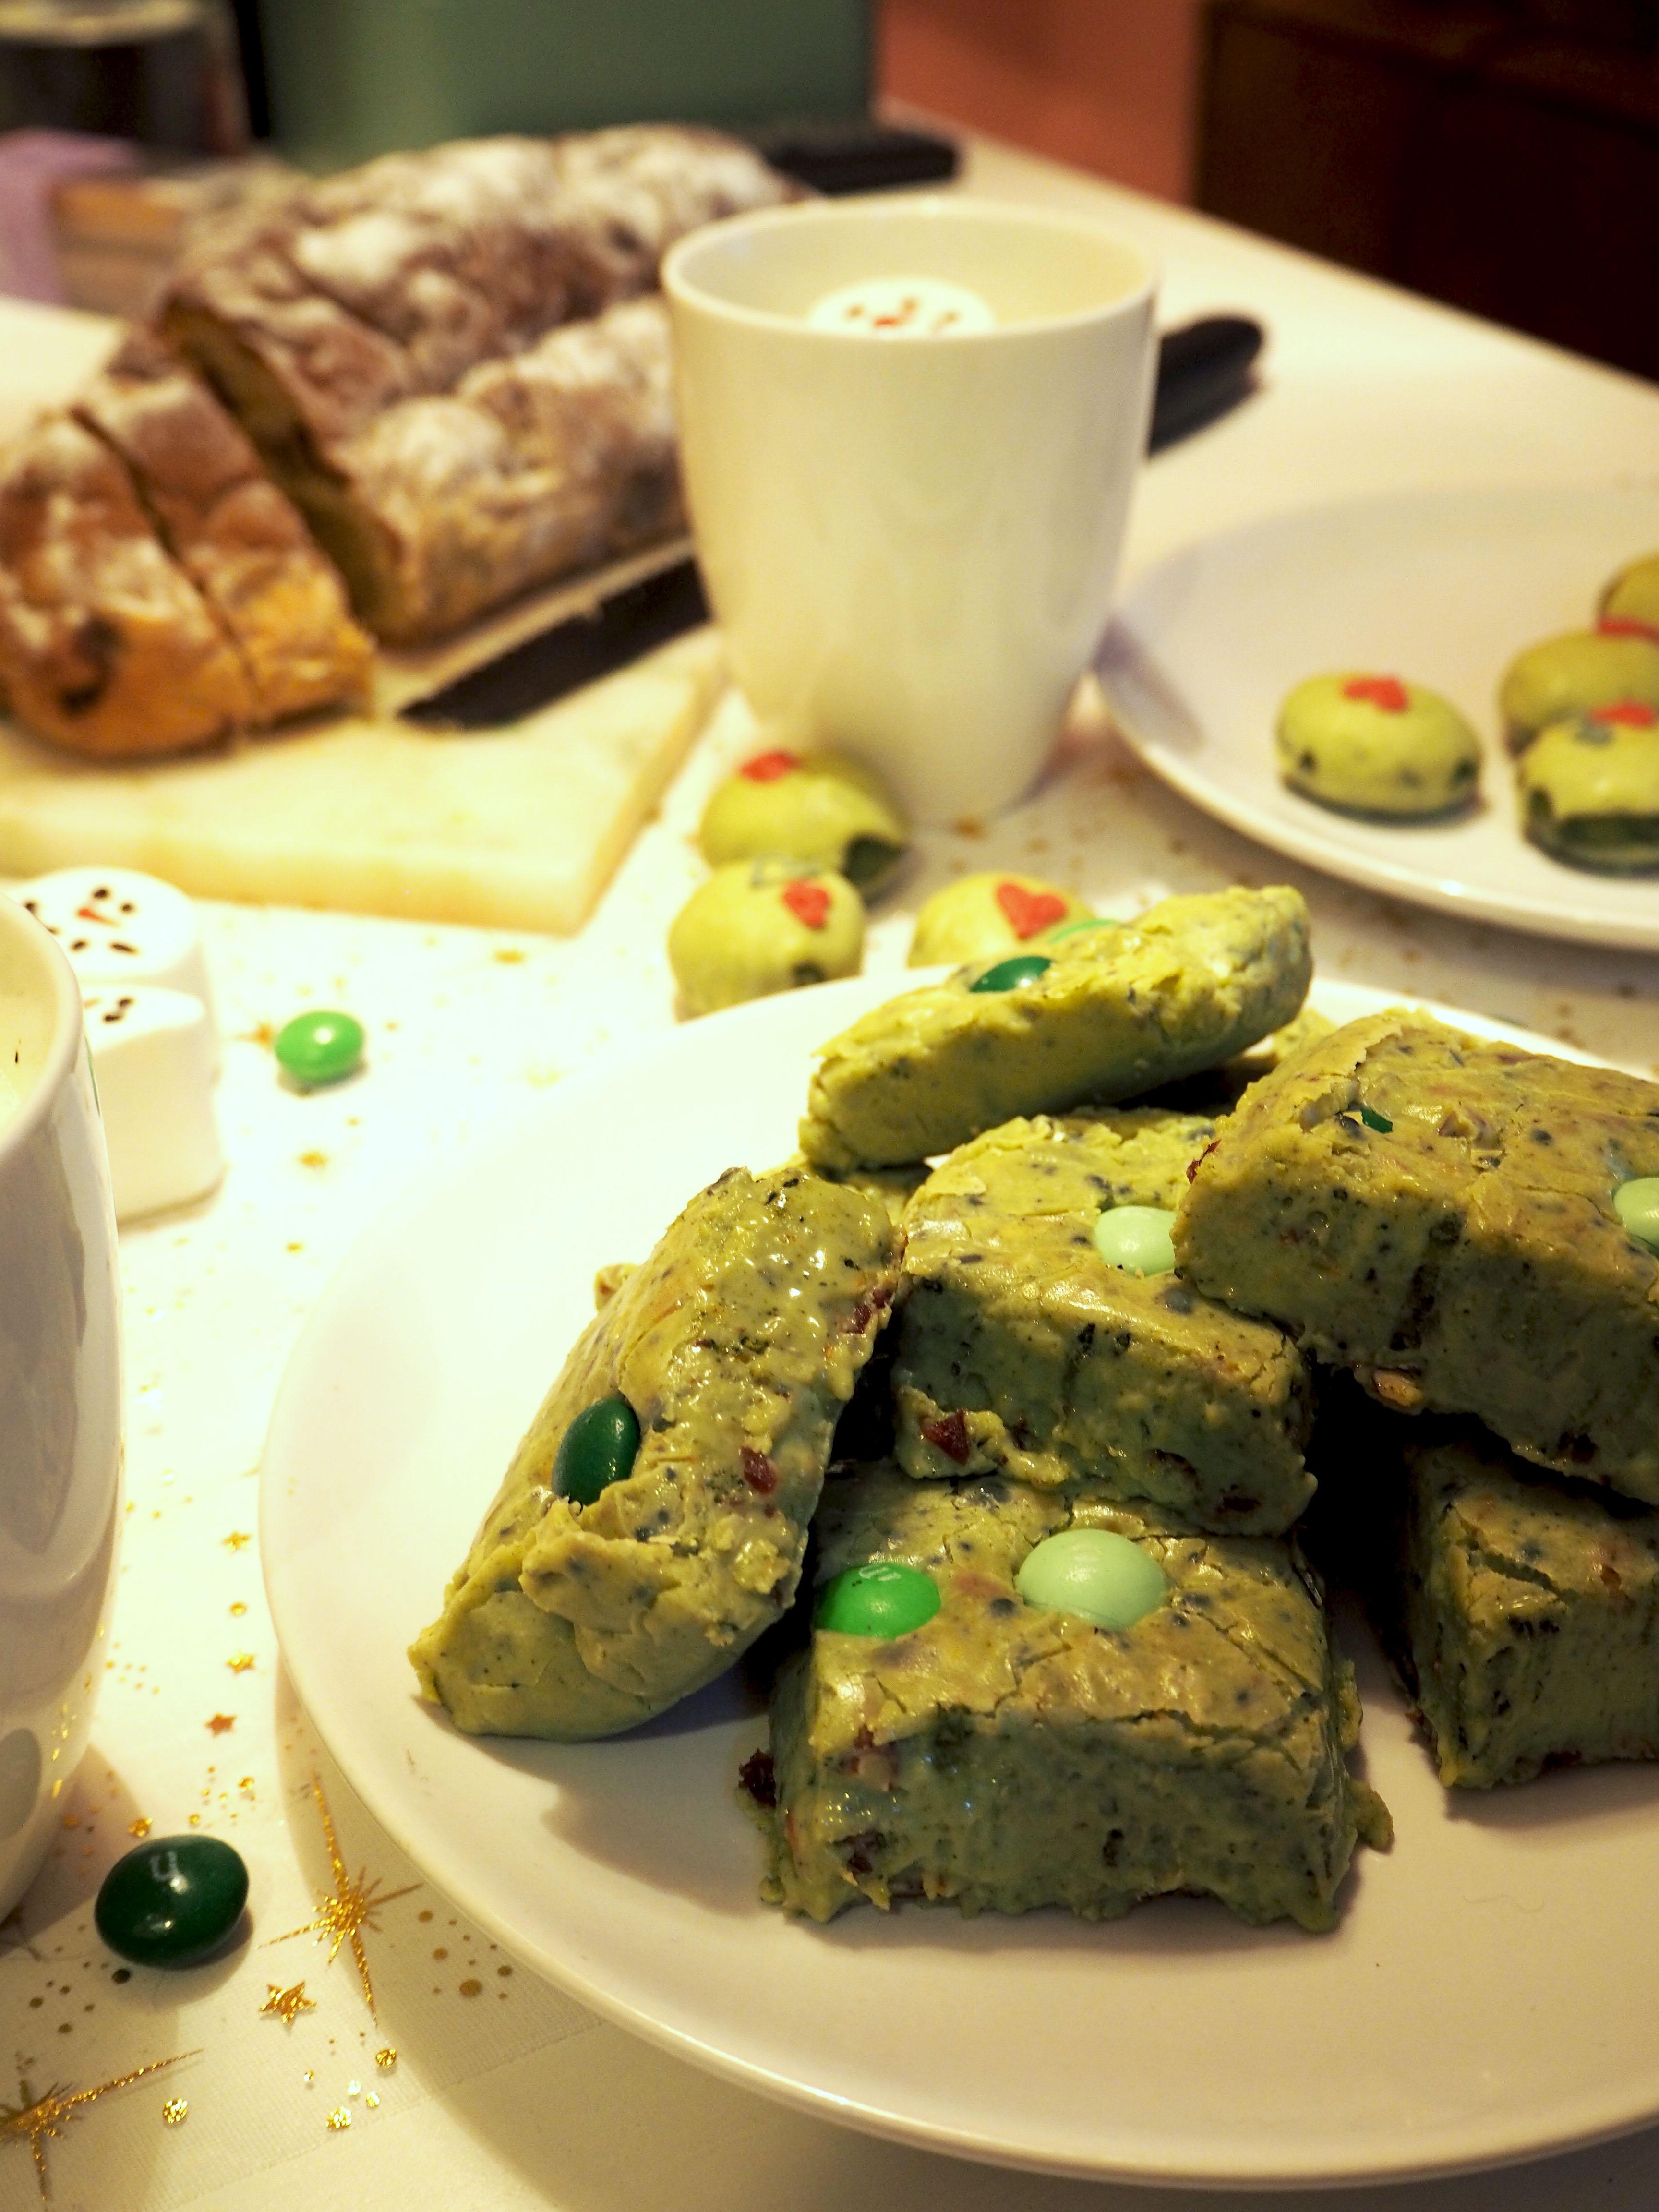 grinch chocolade fudge met matcha groene theepoeder